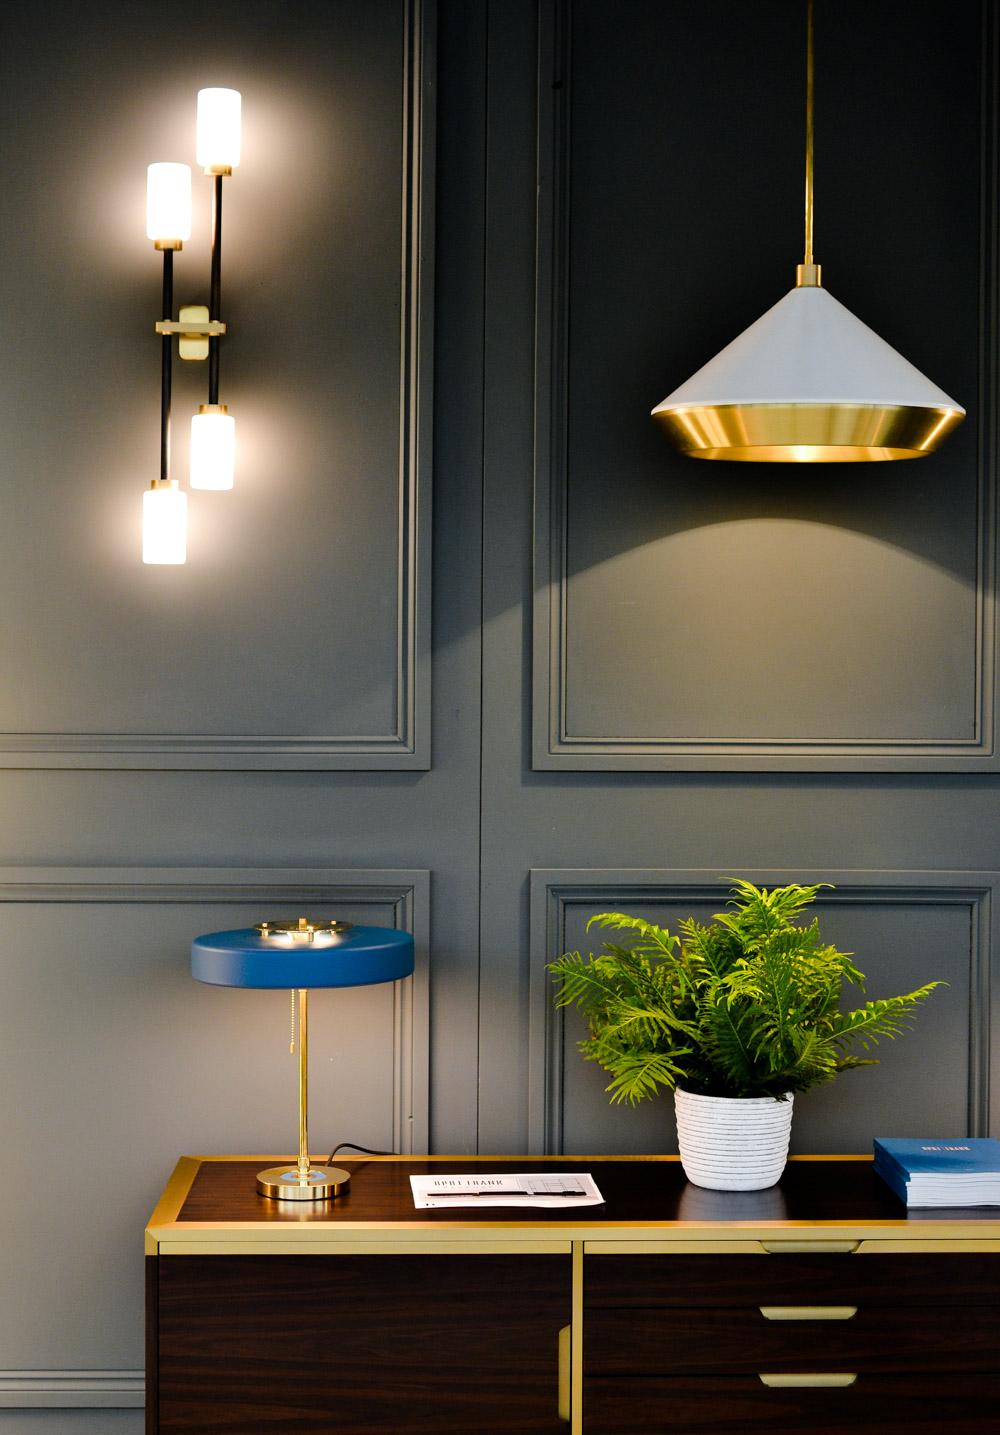 2017 Interior Design Trends Home Decor Trend Report - Mixed Metal Lighting via Bert & Frank